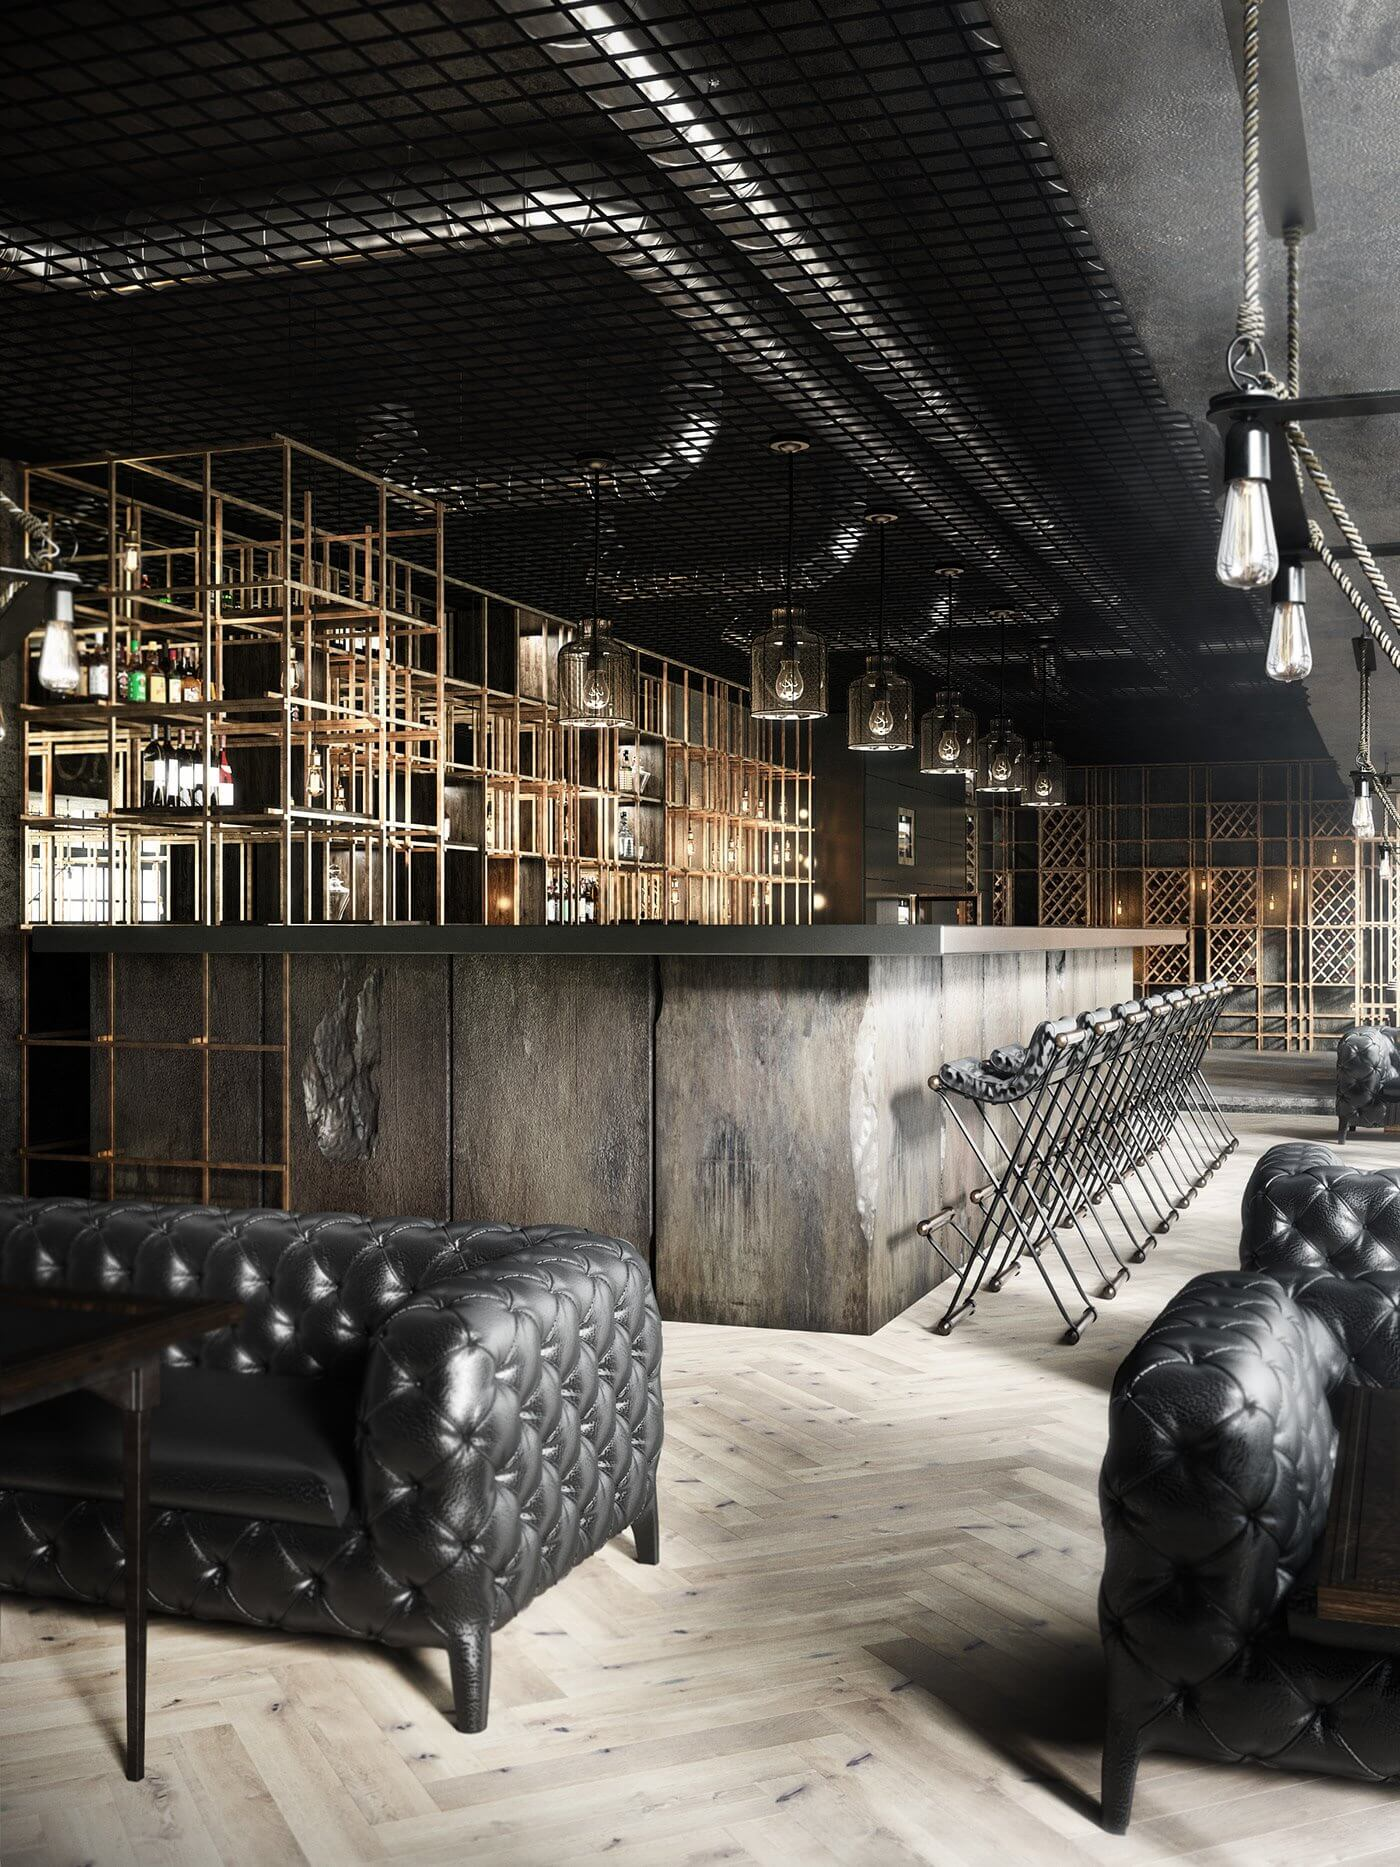 Restaurant Aut vincere aut mori bar stone - cgi visualization